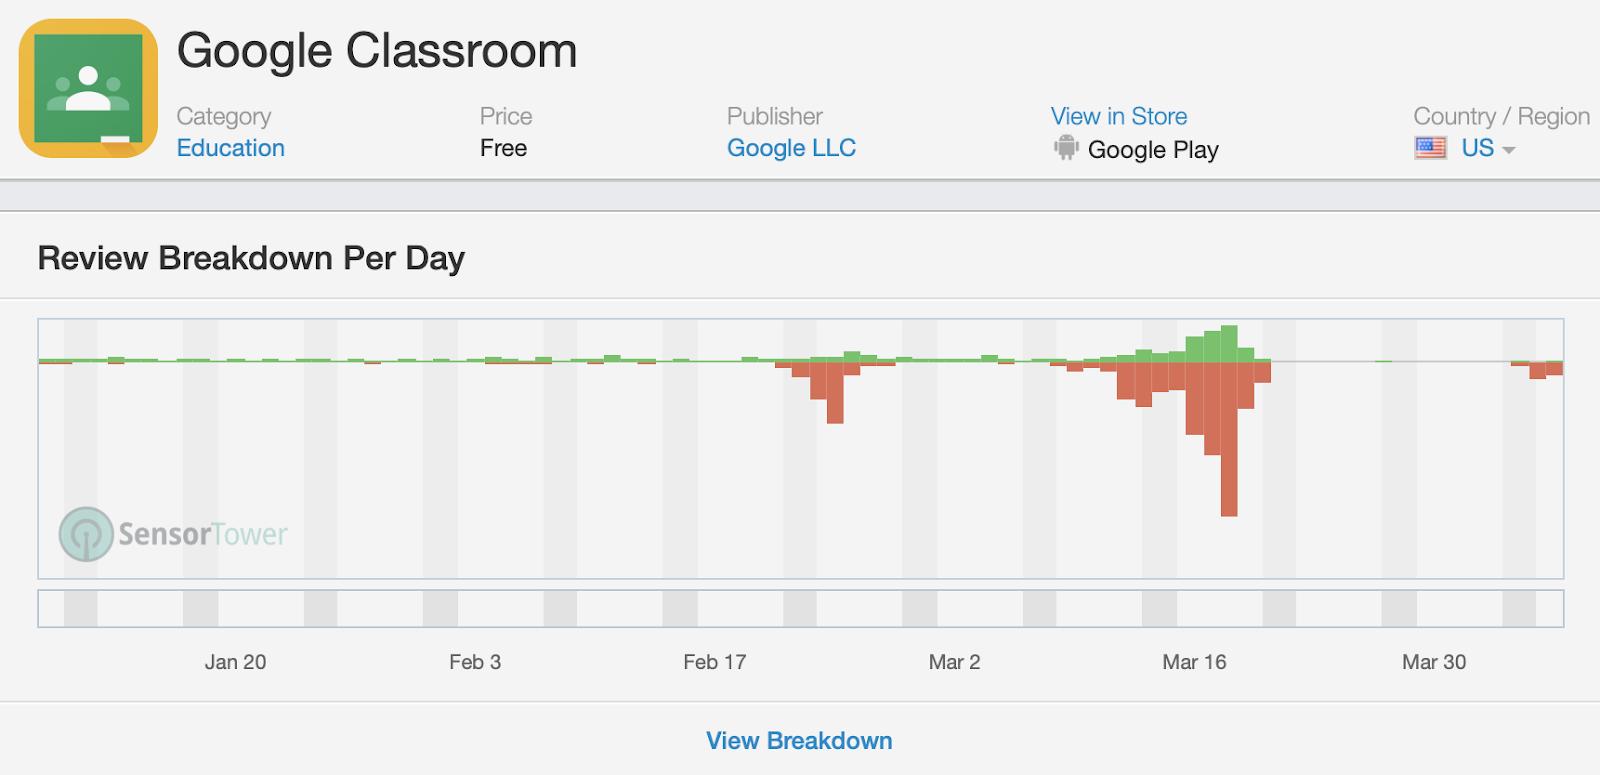 Google Classroom Review Breakdown per day